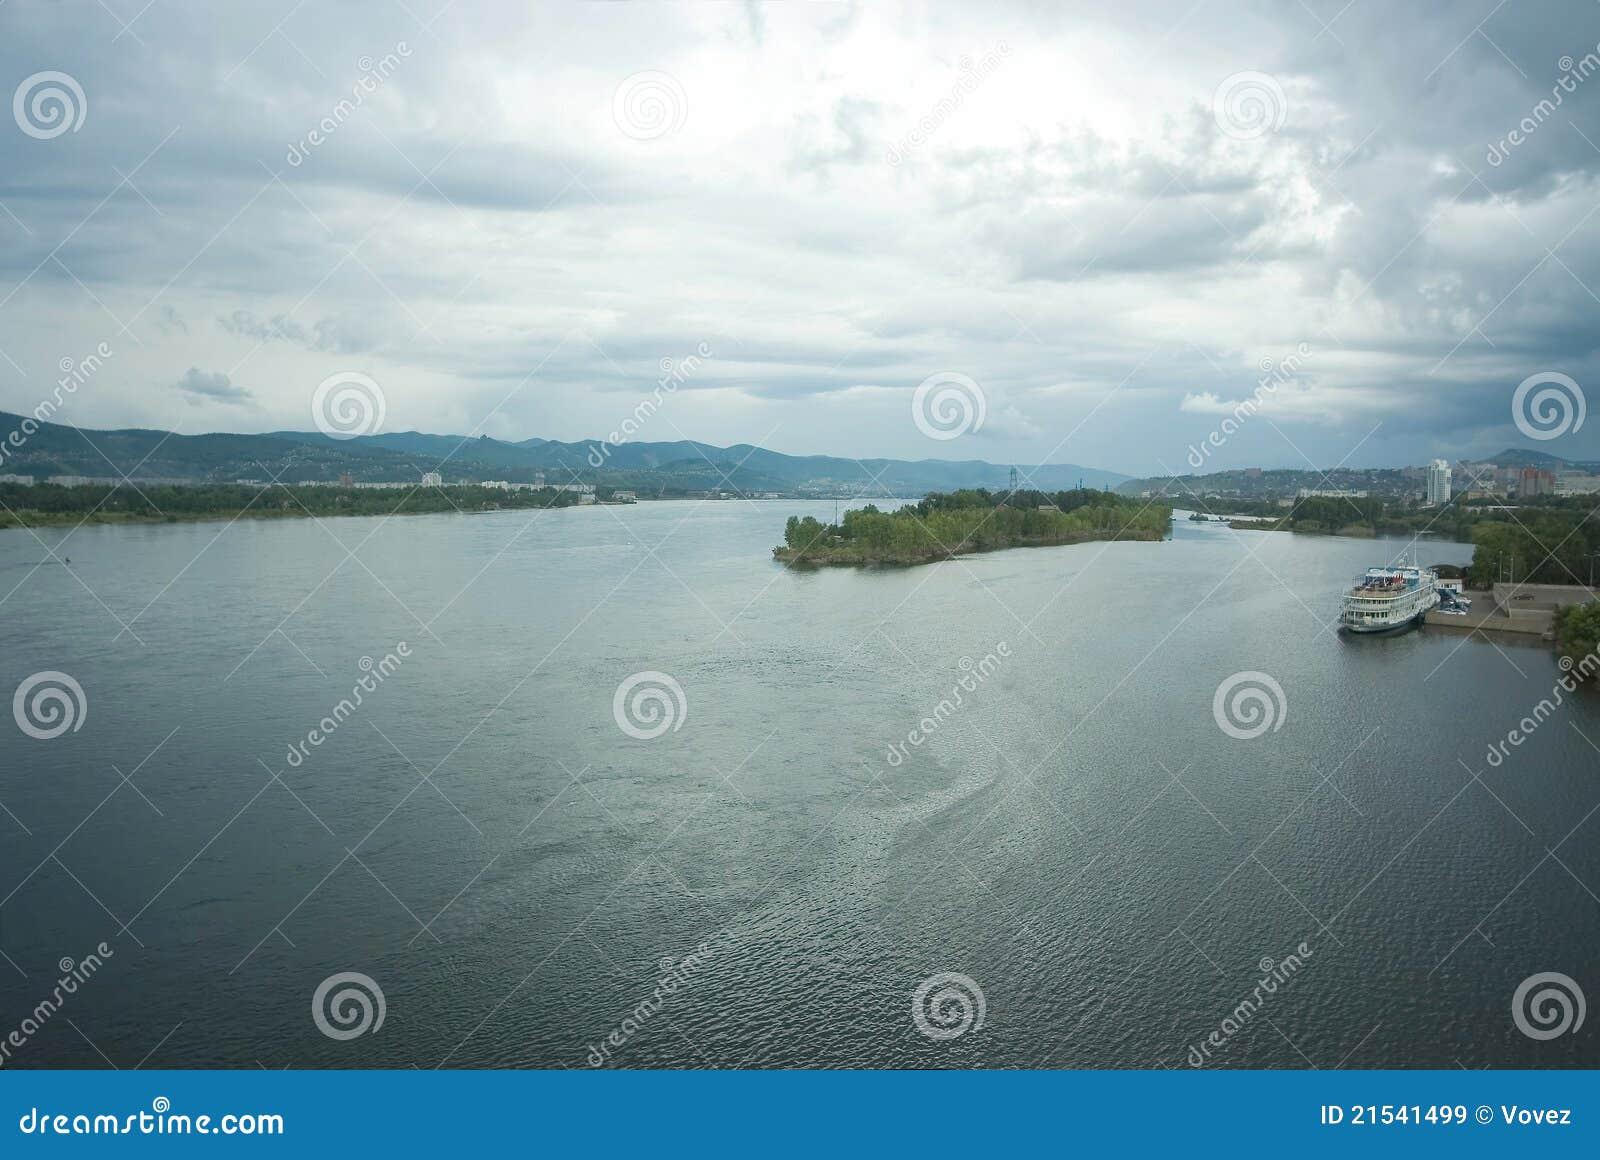 Krasnoyarsk, river Yenisei